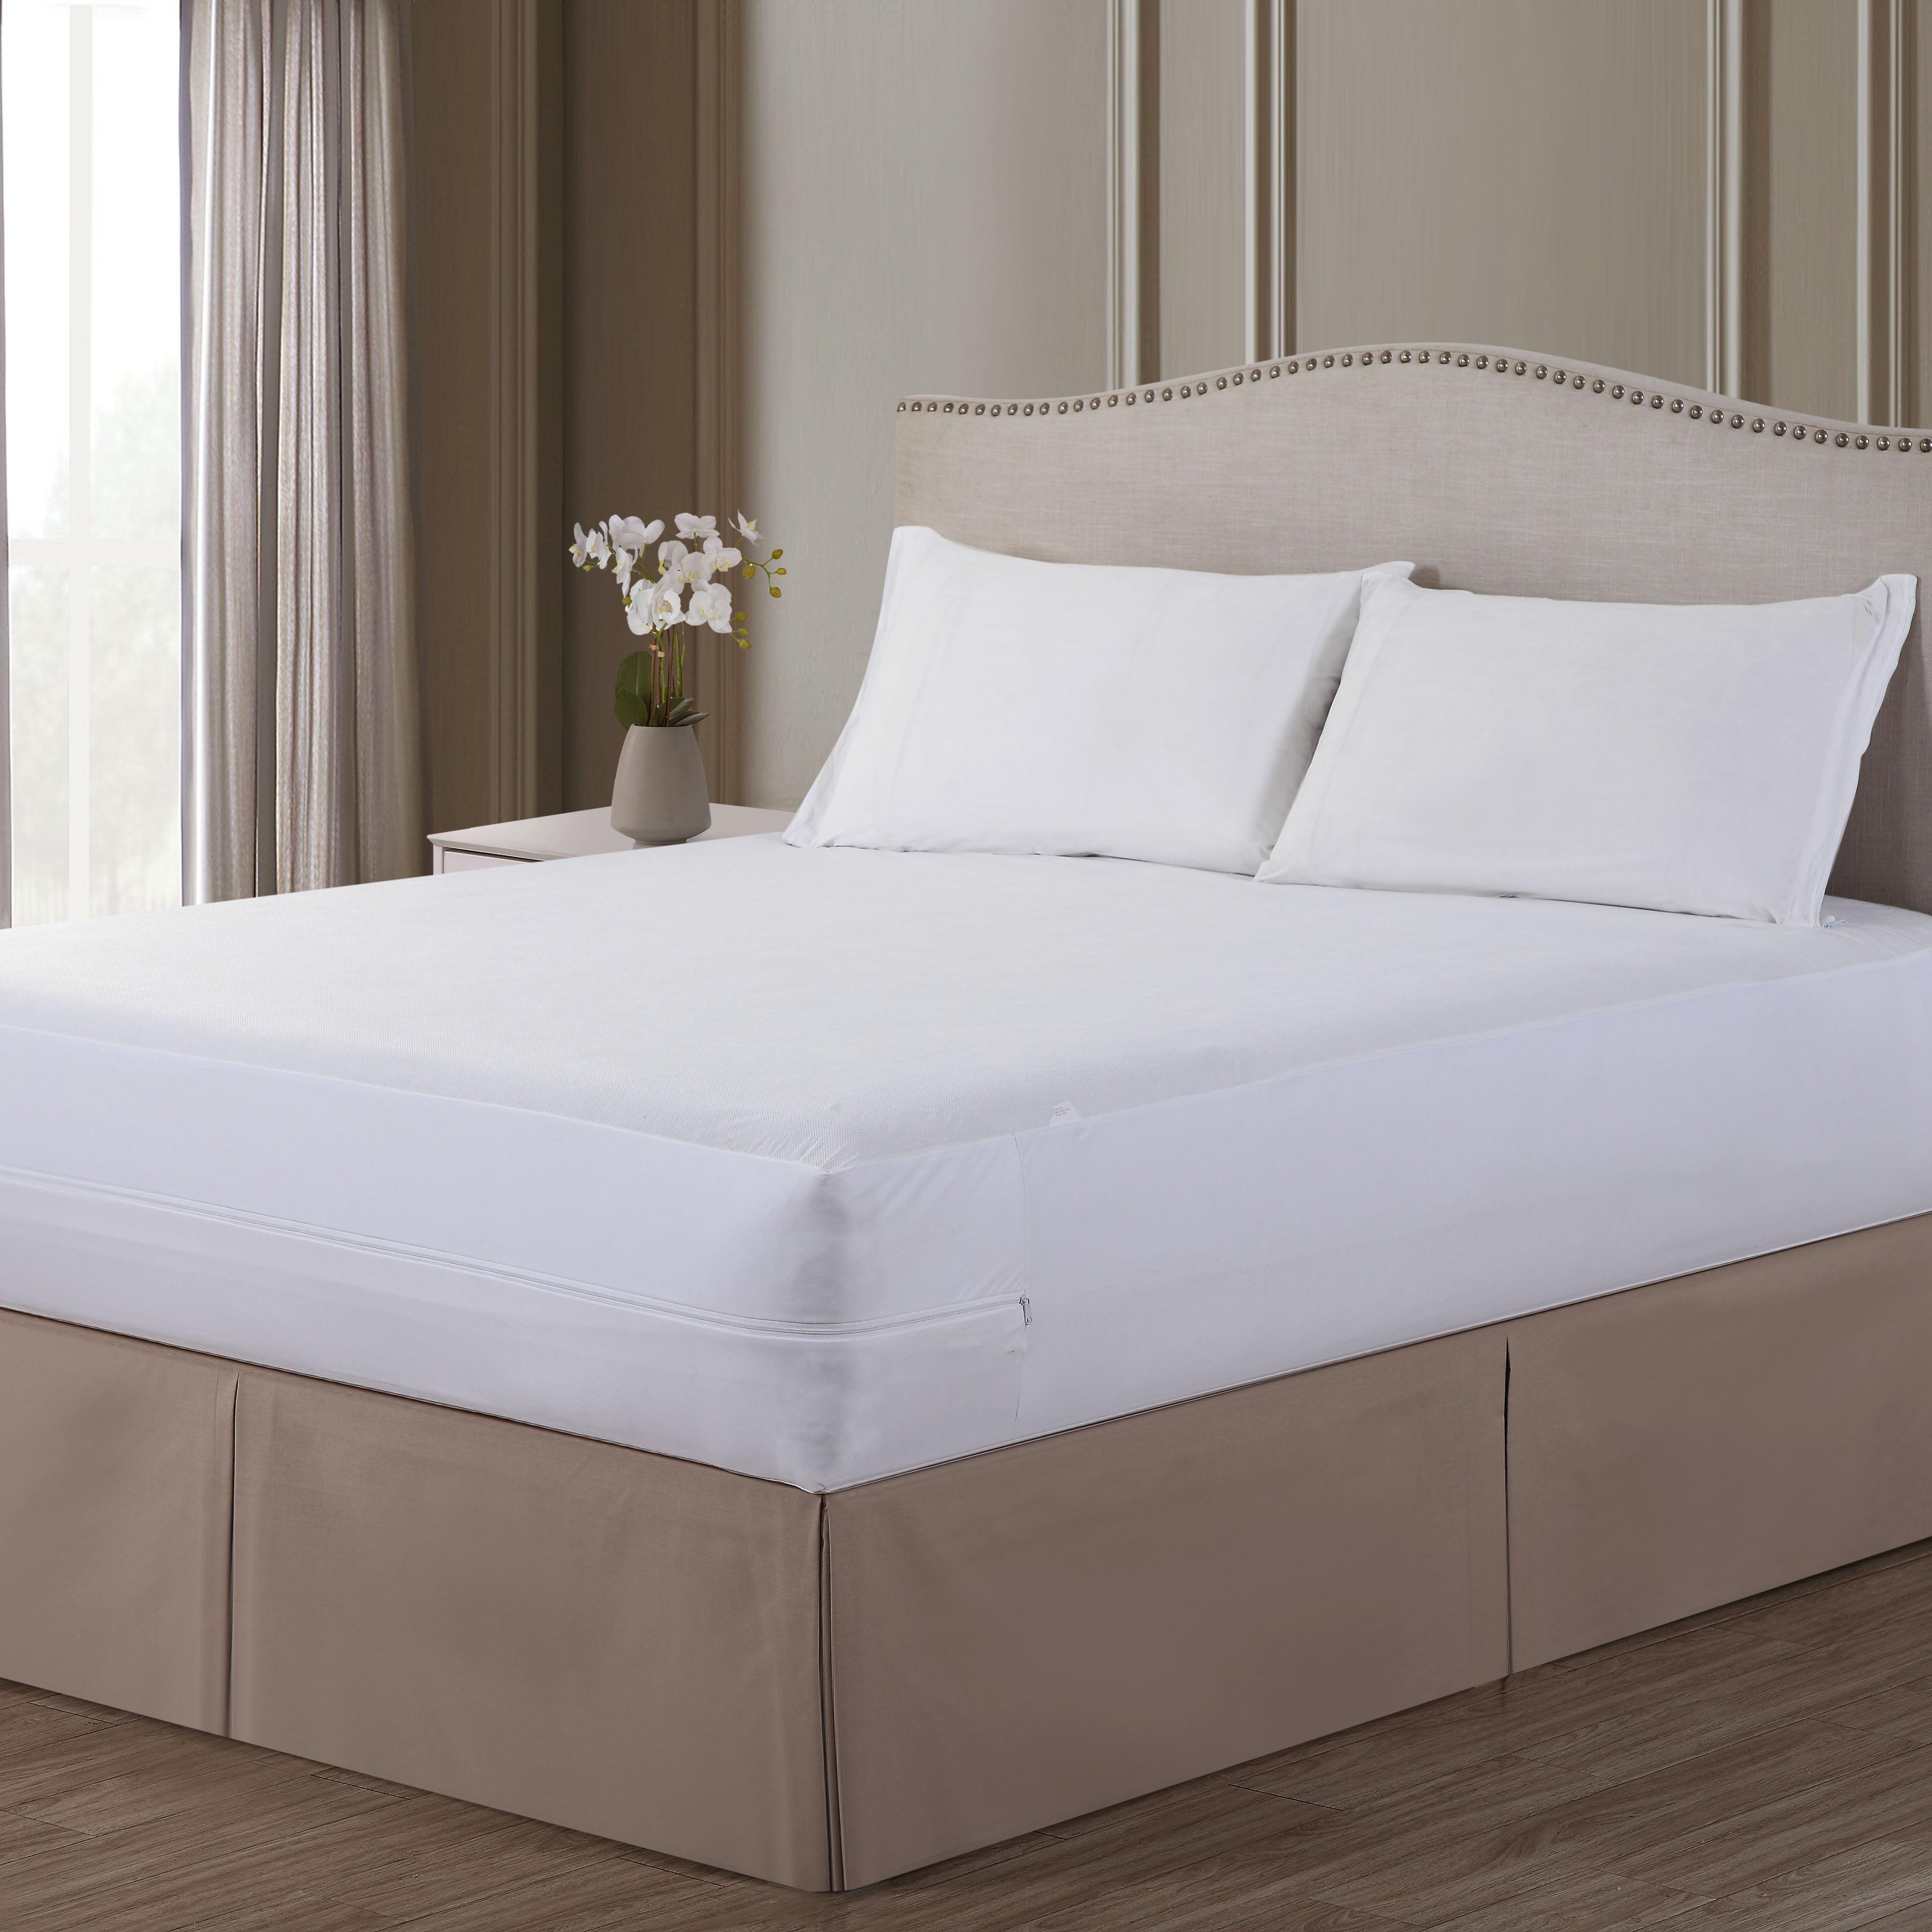 Original Bed Bug Blocker Zippered Mattress Cover Protector Walmartcom